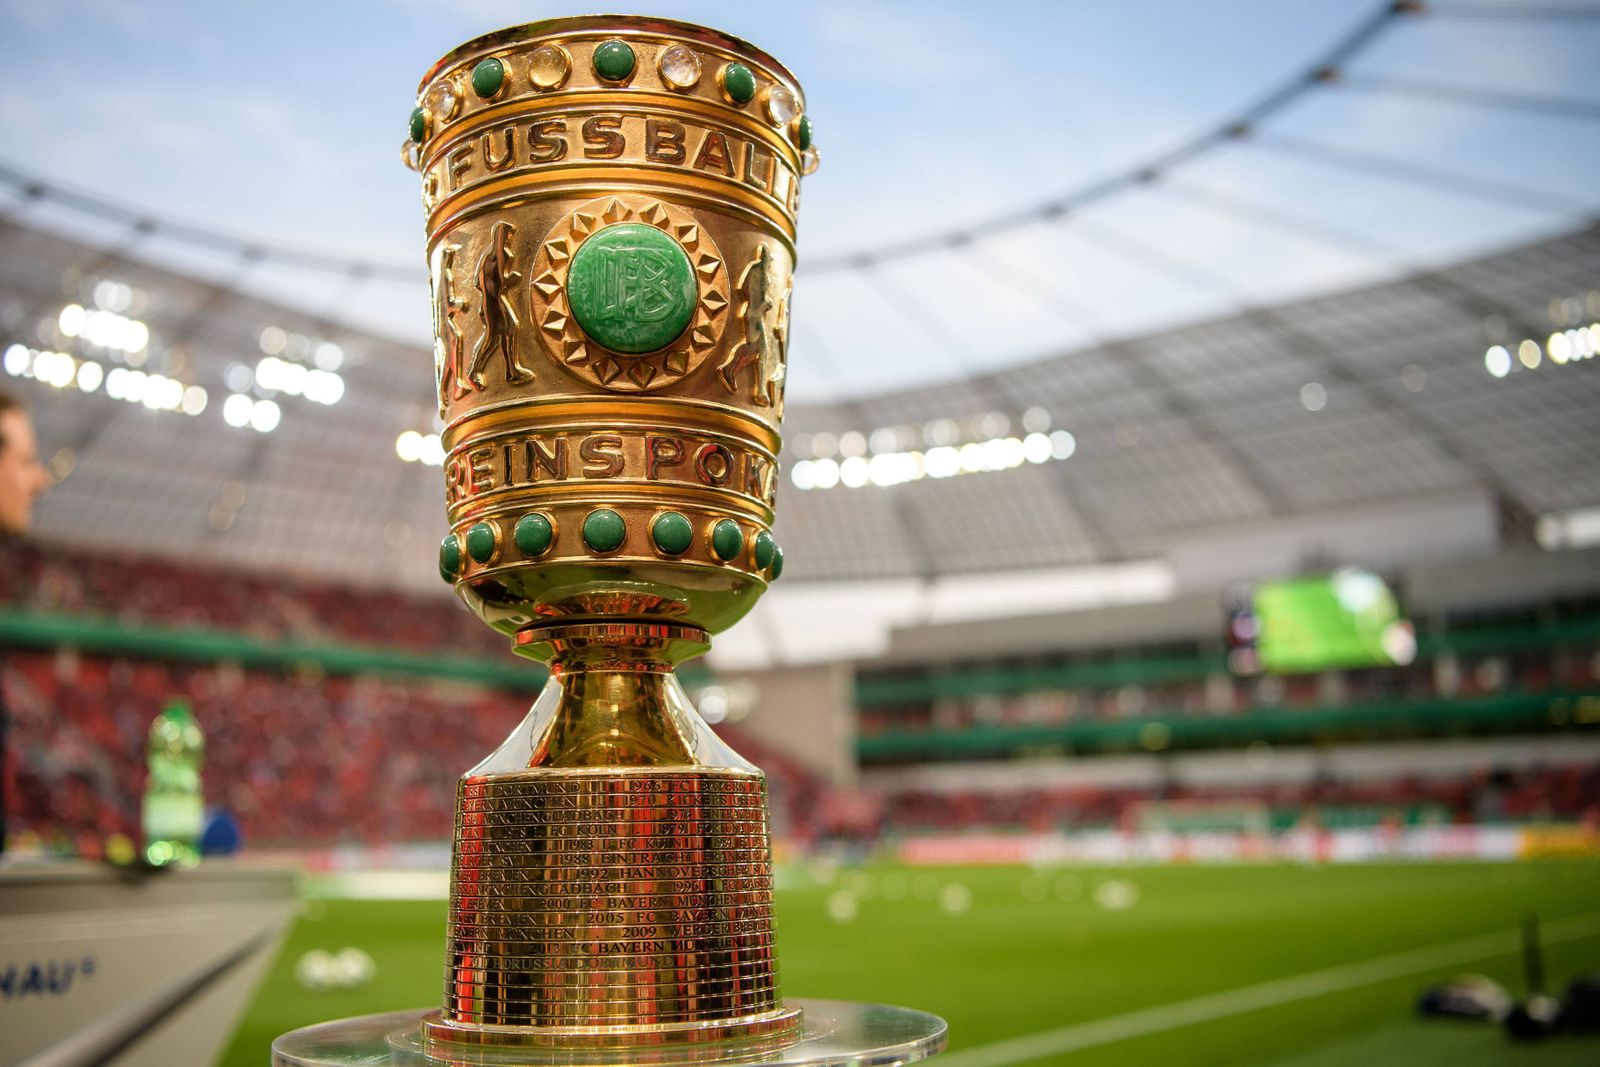 Bayer 04 Leverkusen vs FC Bayern München, Fussball DFB Pokal Halbfinale, 17.04.2018 Pokal vor dem Halbfinalespiel zwisc